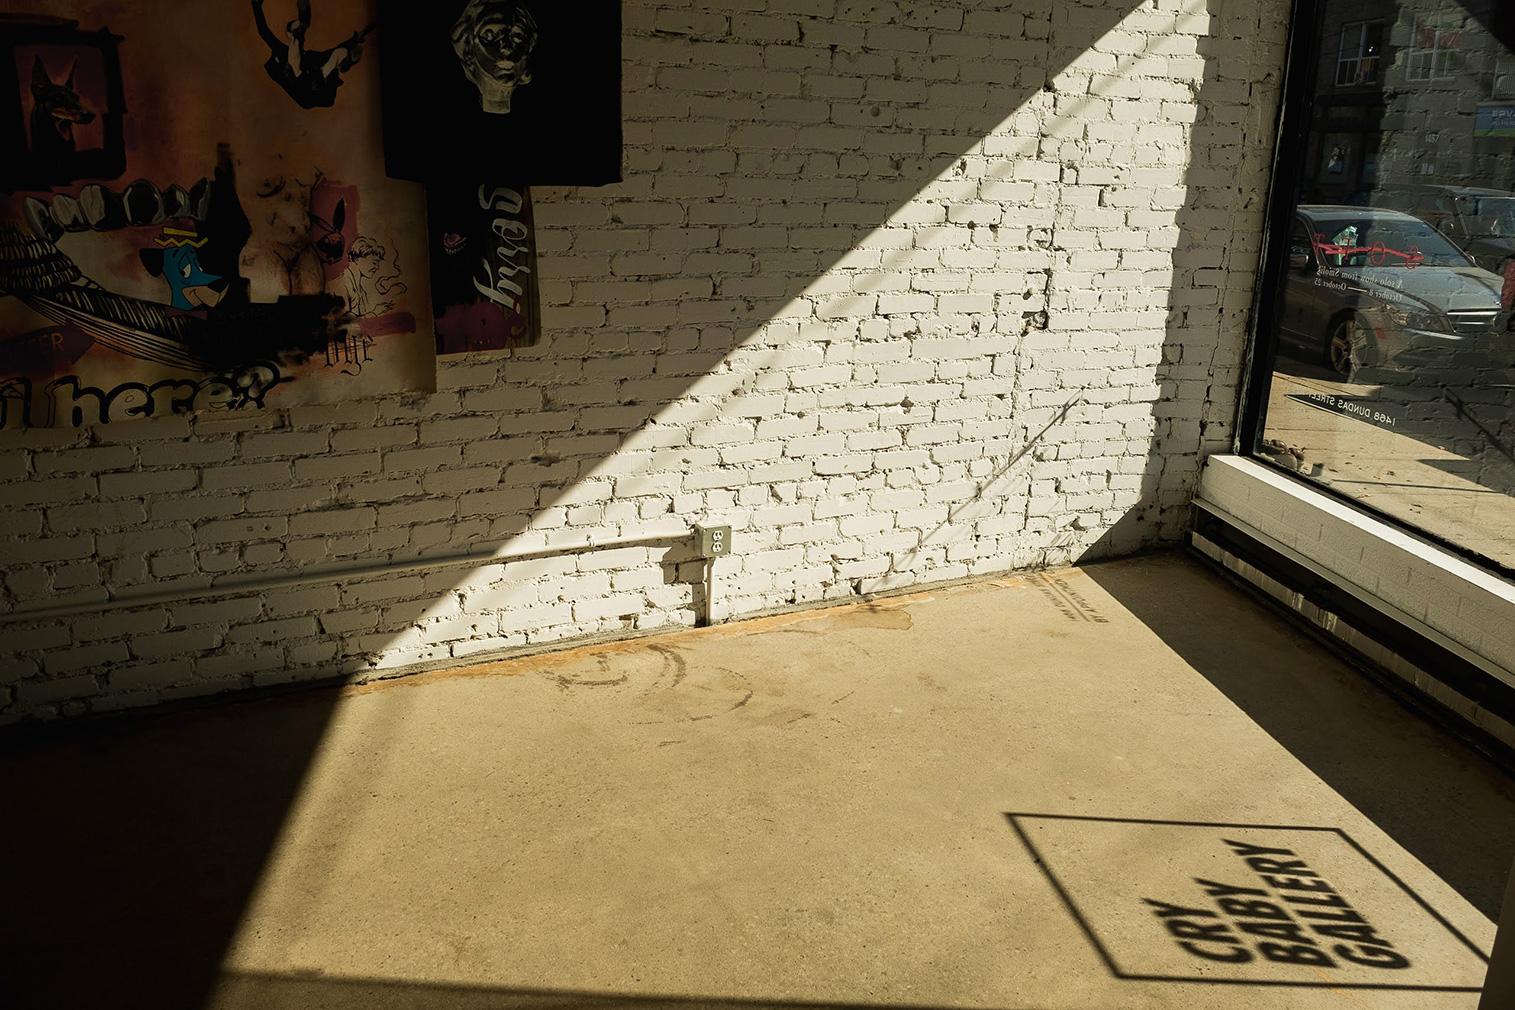 Toronto's gritty Cry Baby Gallery hides secret speakeasy